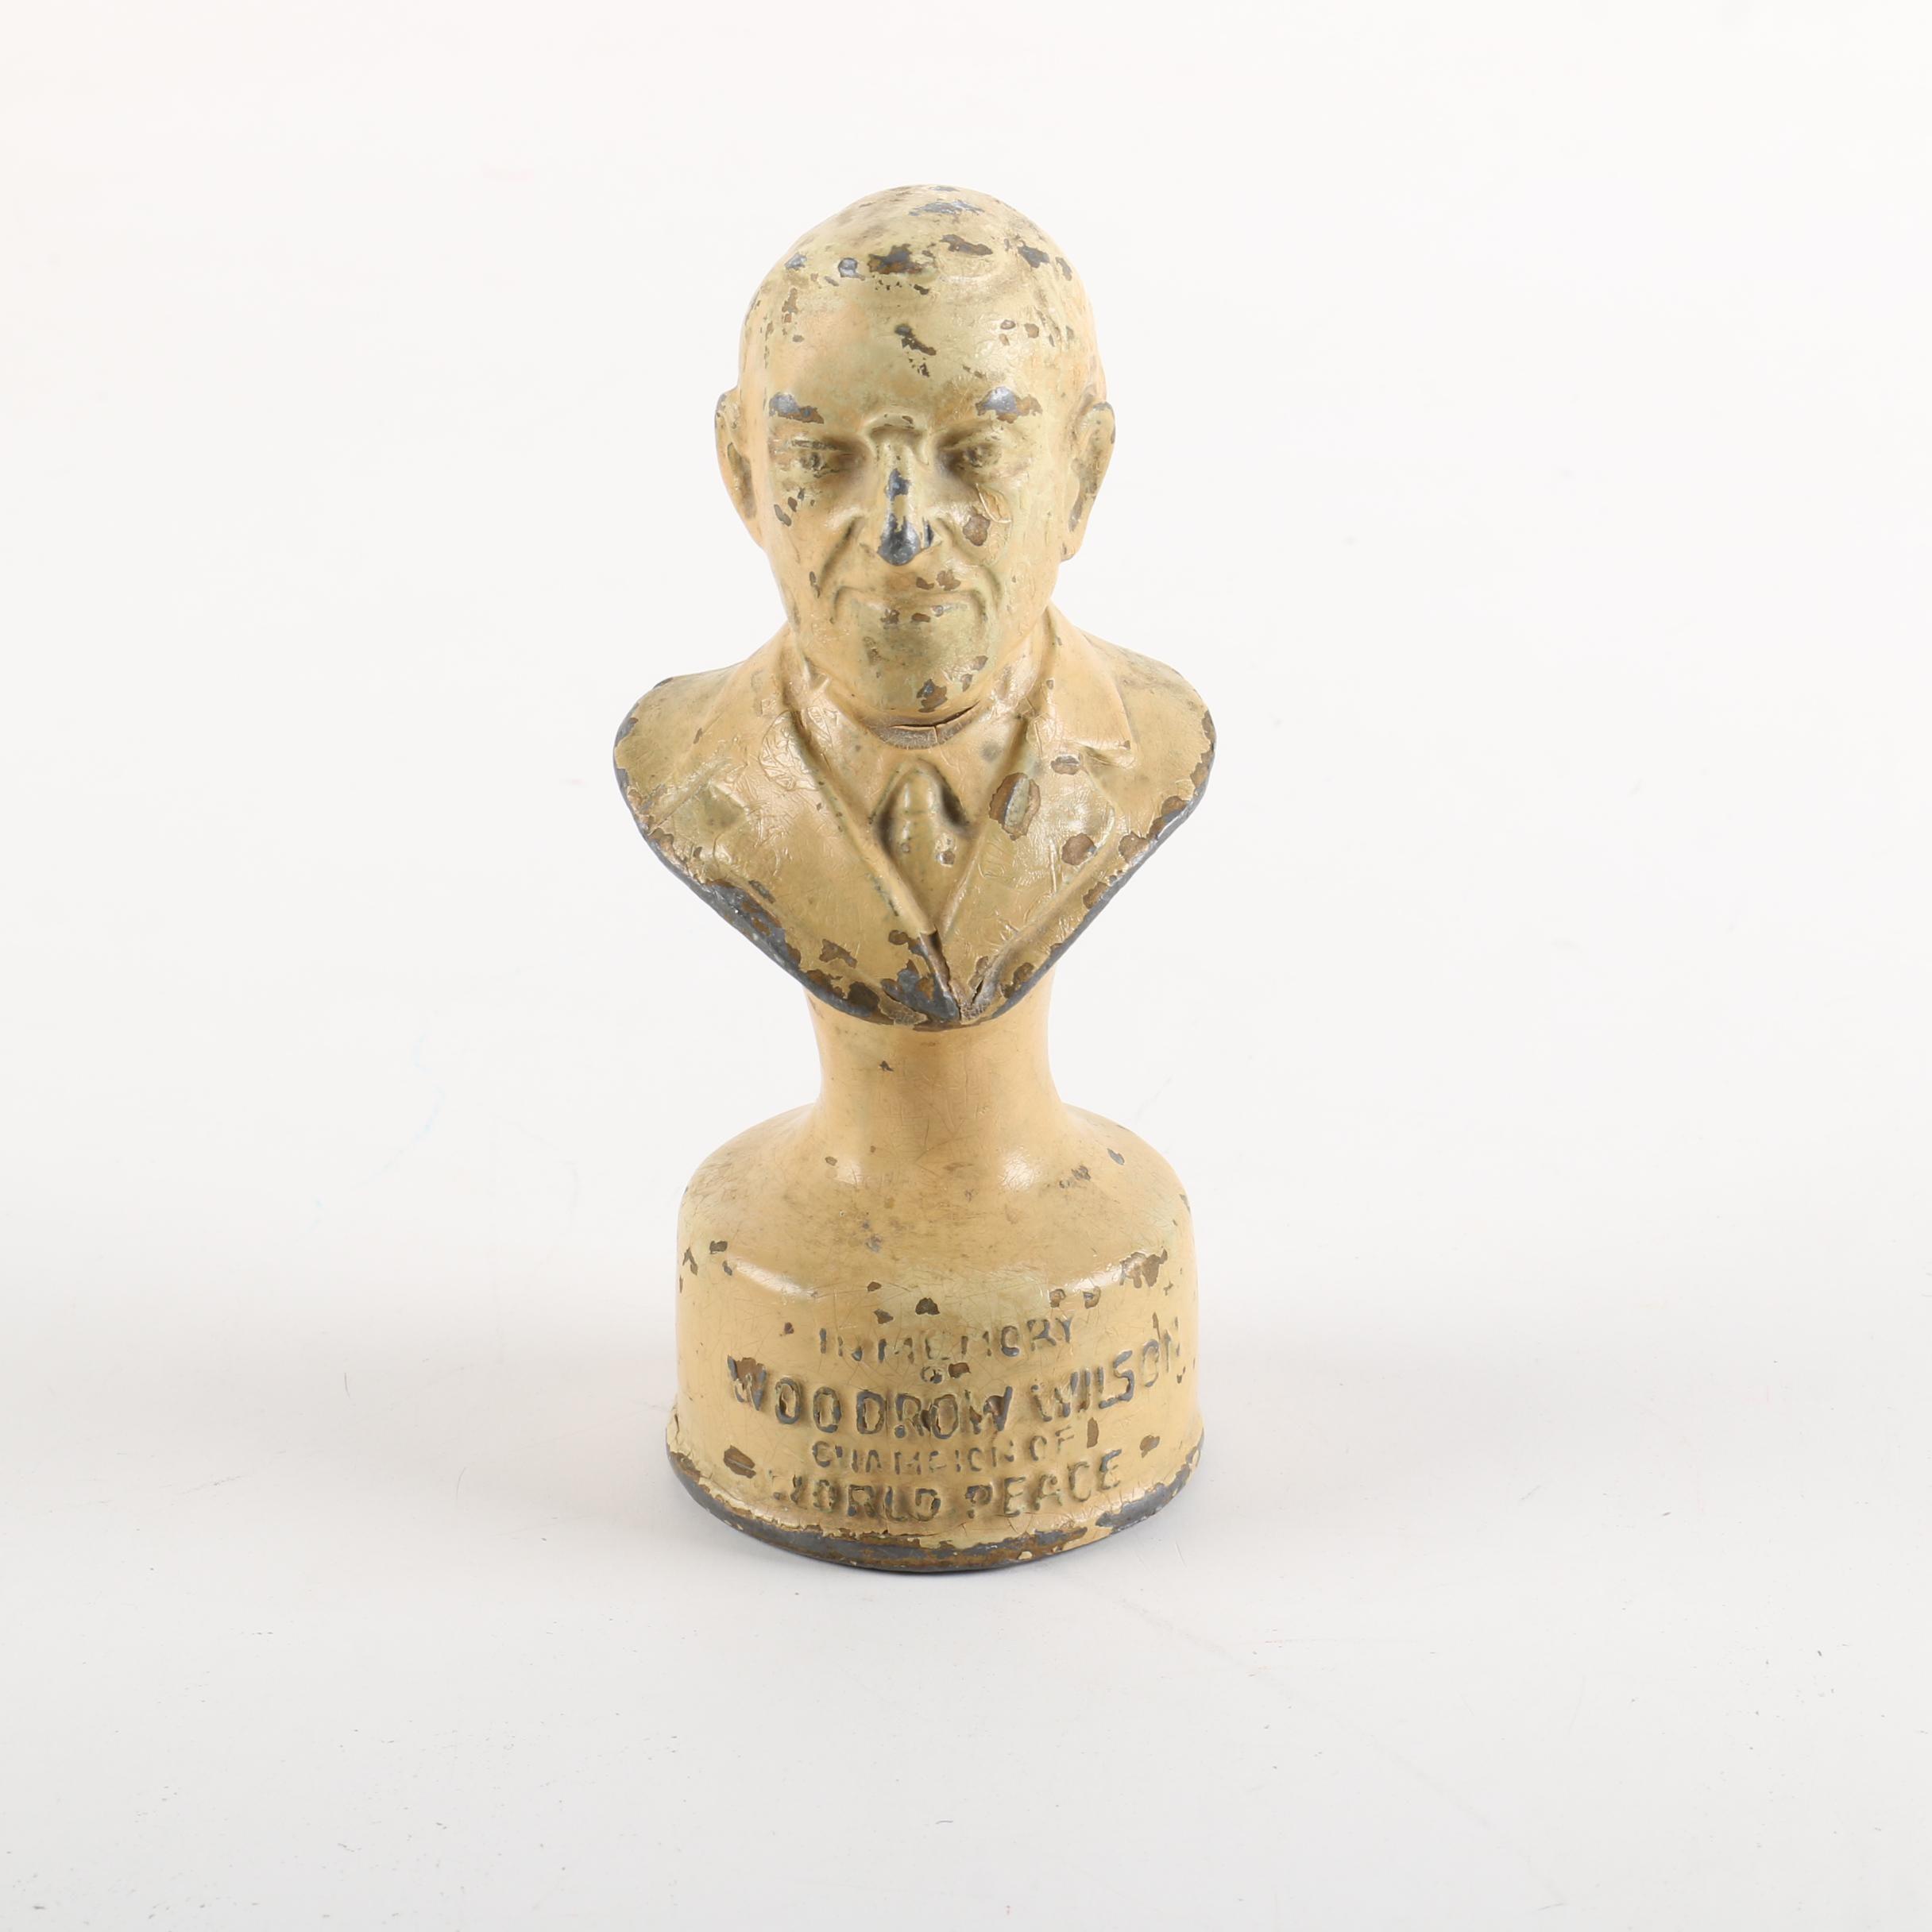 Metal Woodrow Wilson Figurine